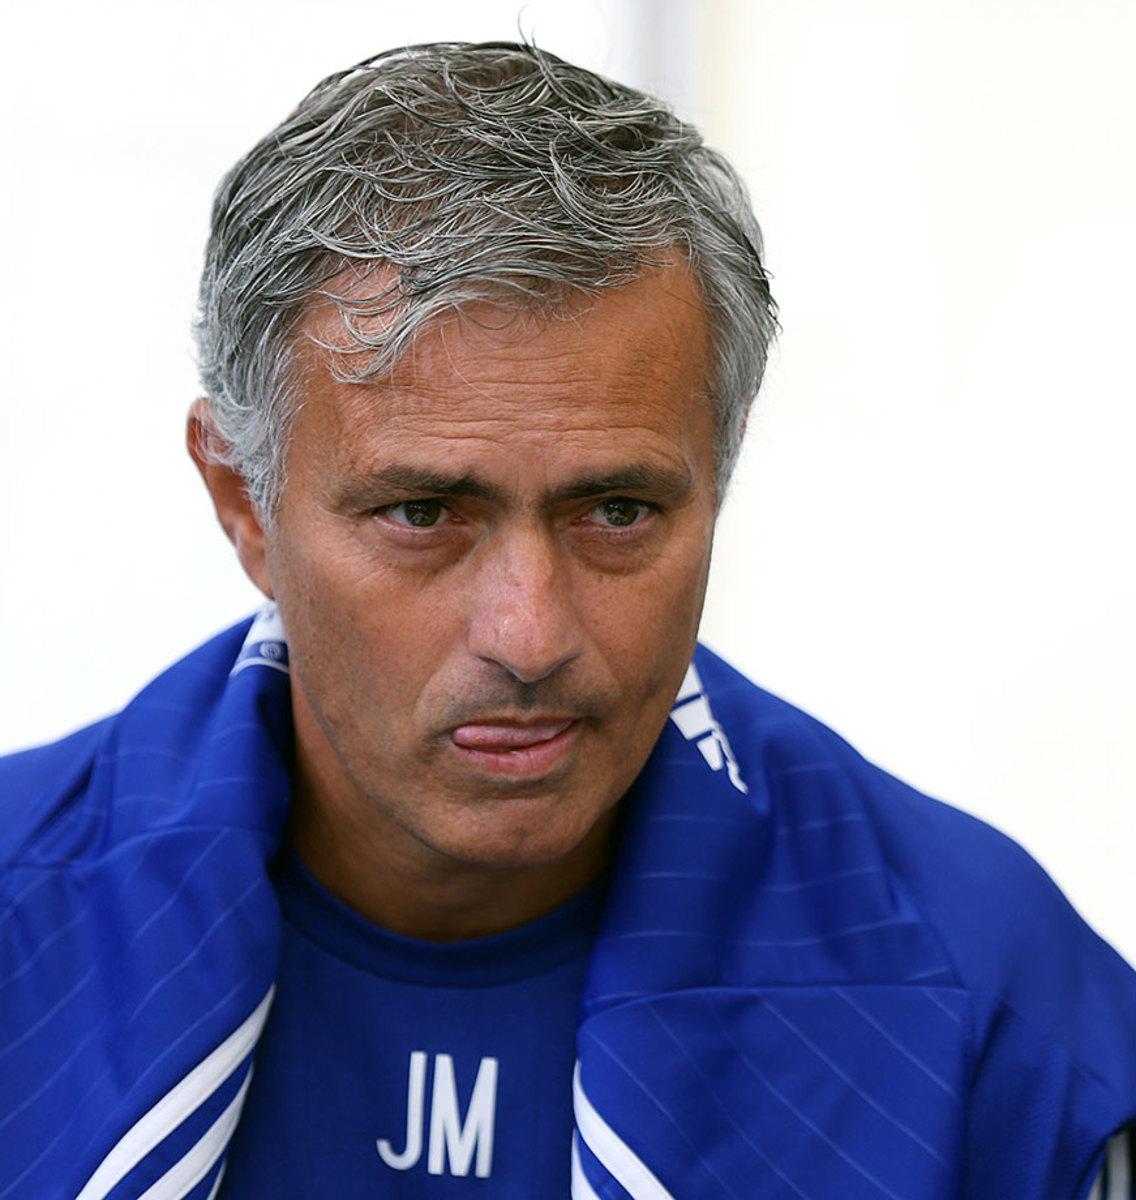 2015-0805-Jose-Mourinho-GettyImages-483006464_master.jpg